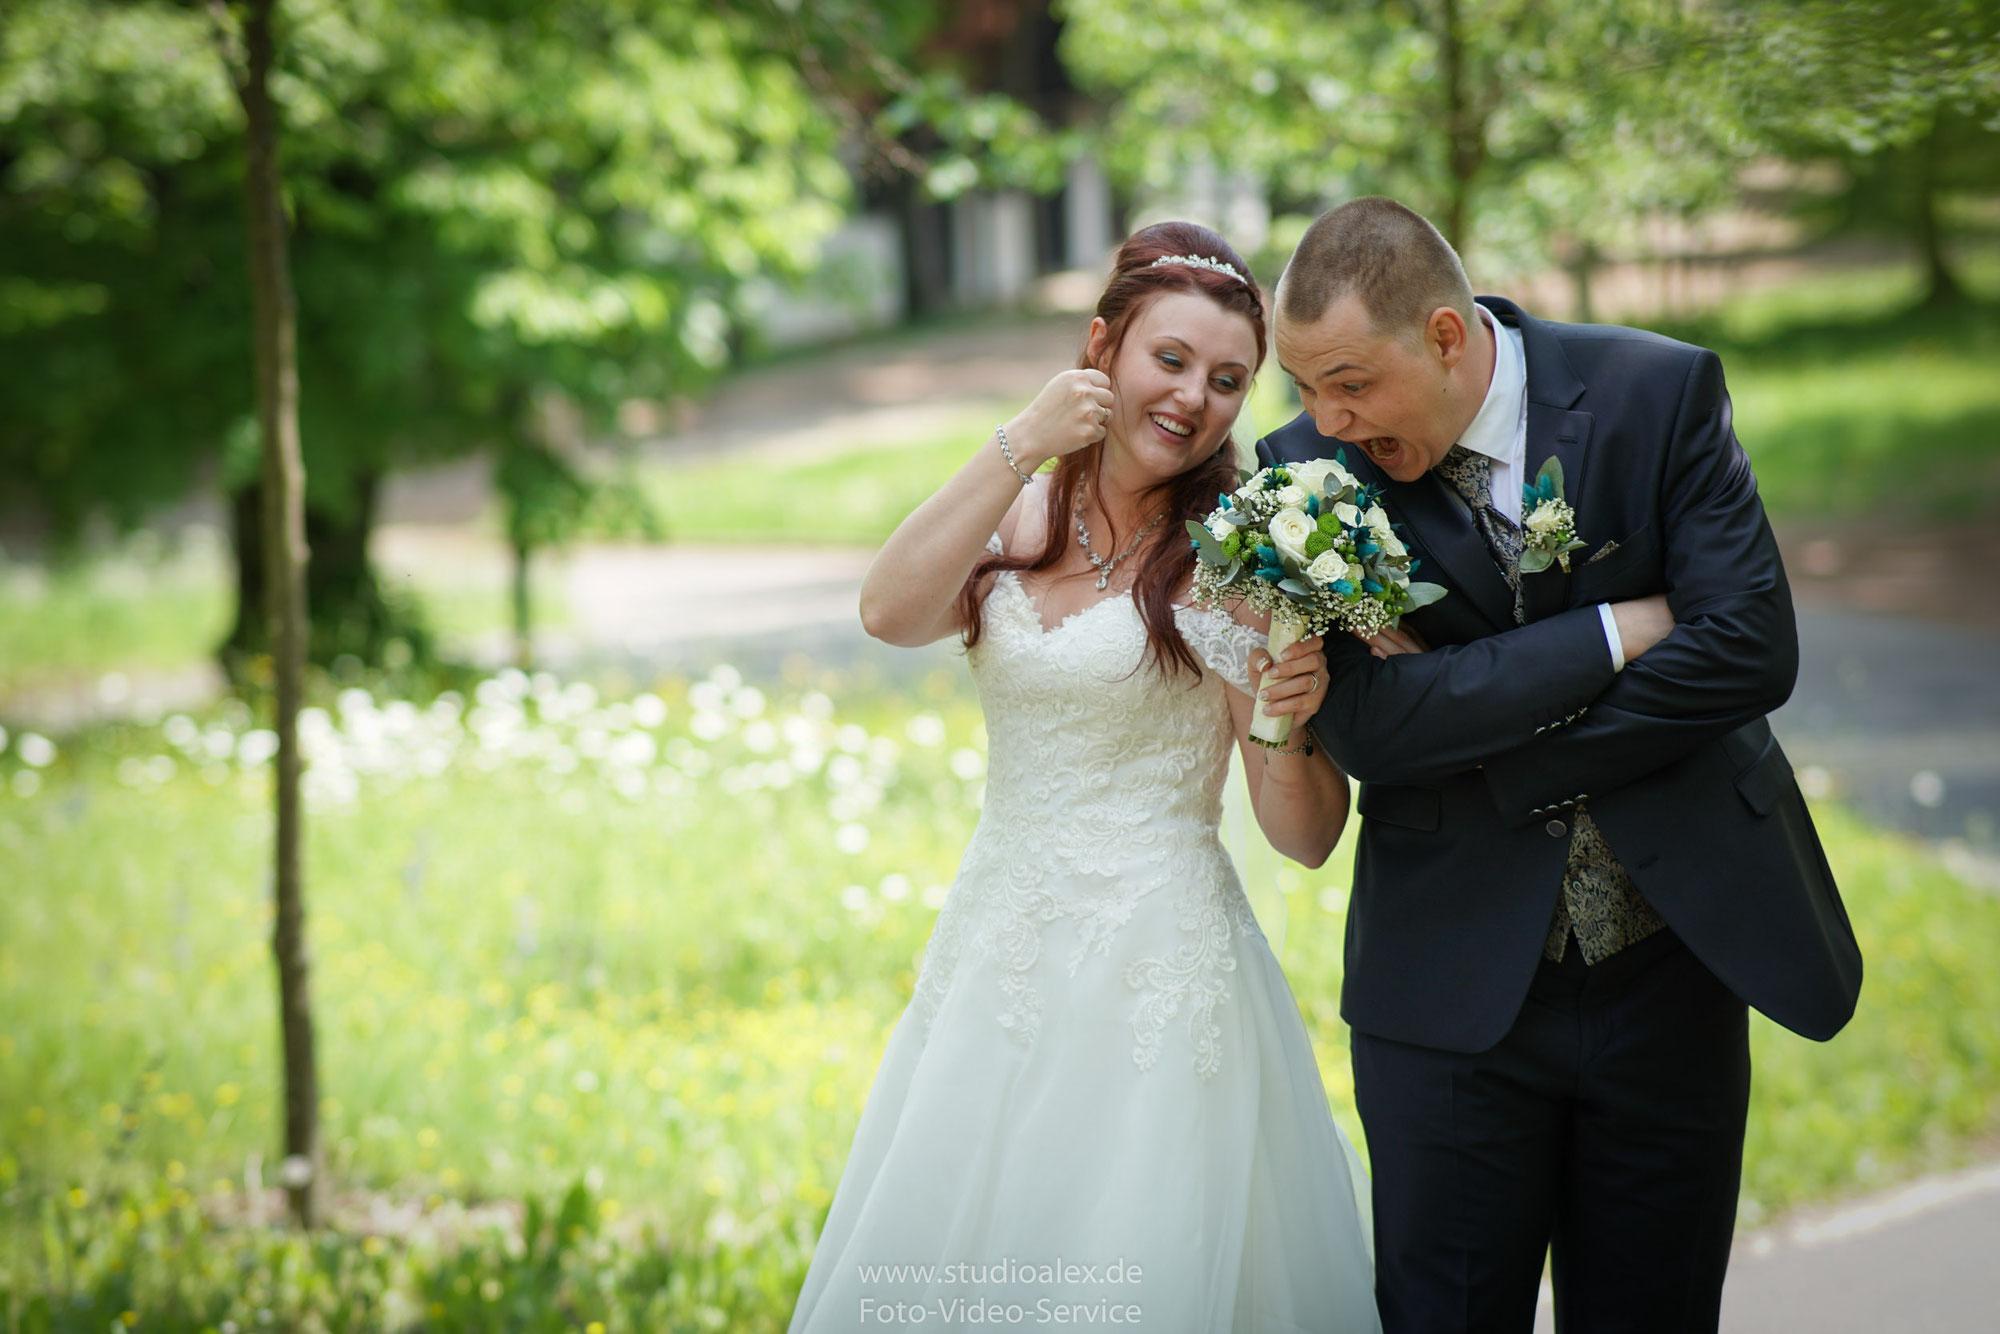 Hochzeitsfotograf in Sulzbach-Rosenberg-Guschin